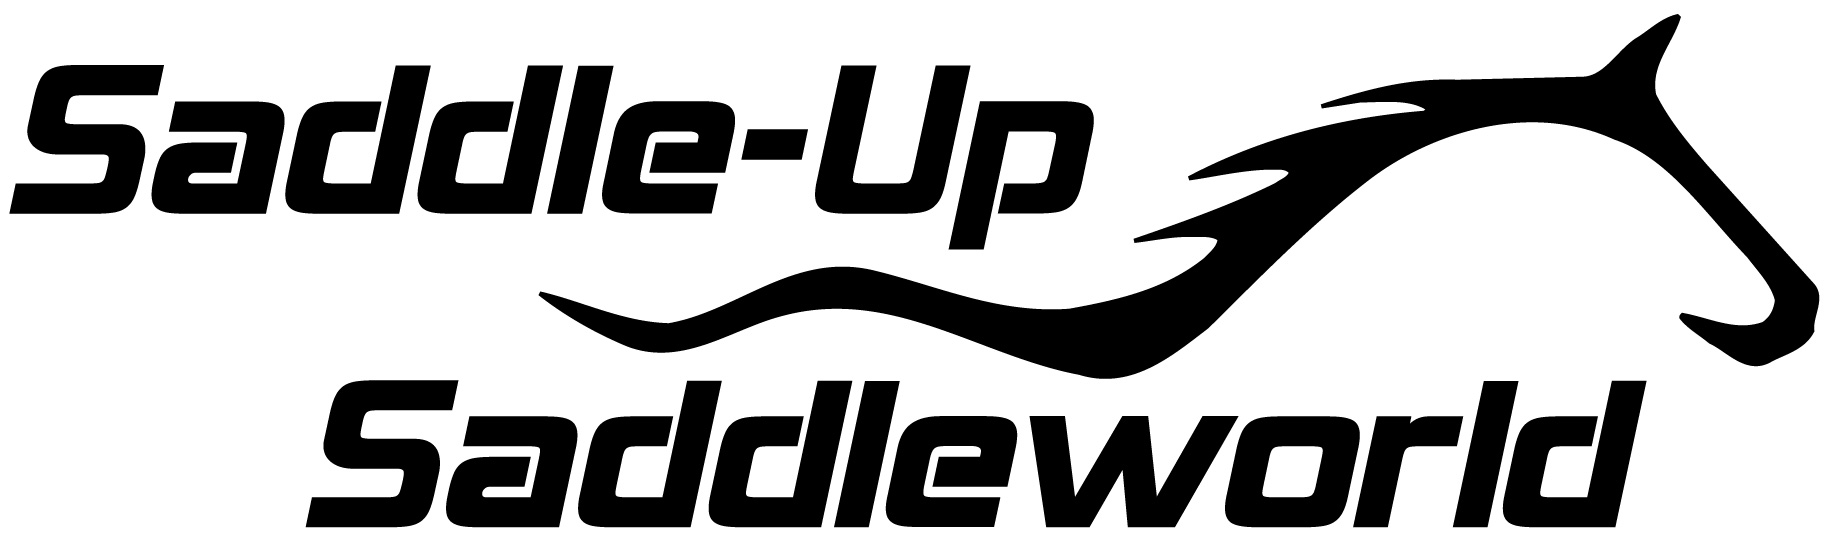 Saddle-Up SW Logo new jpg.jpg